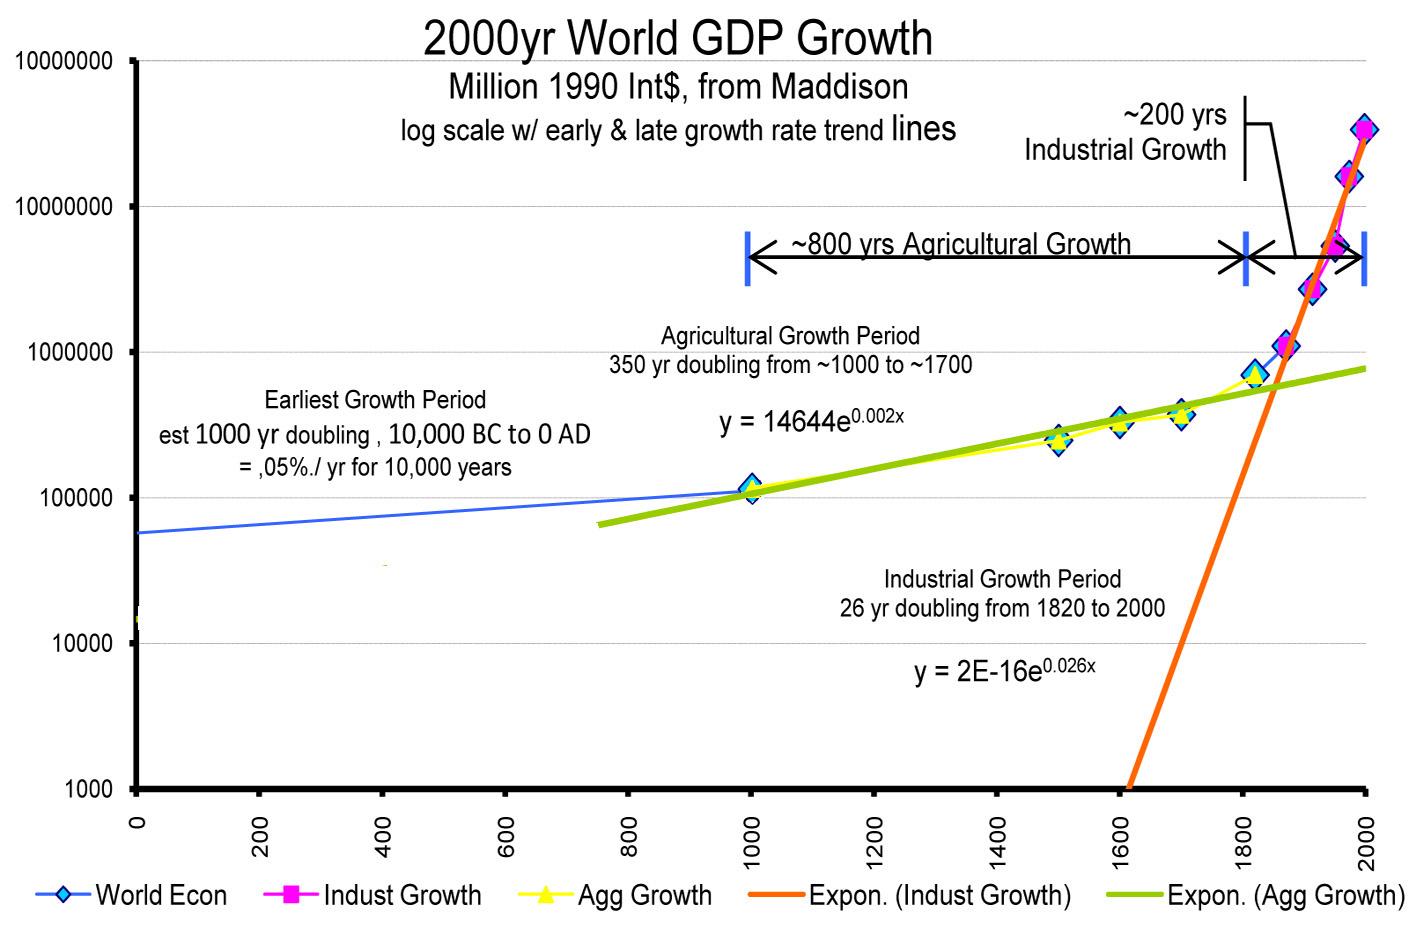 Maddison's world data